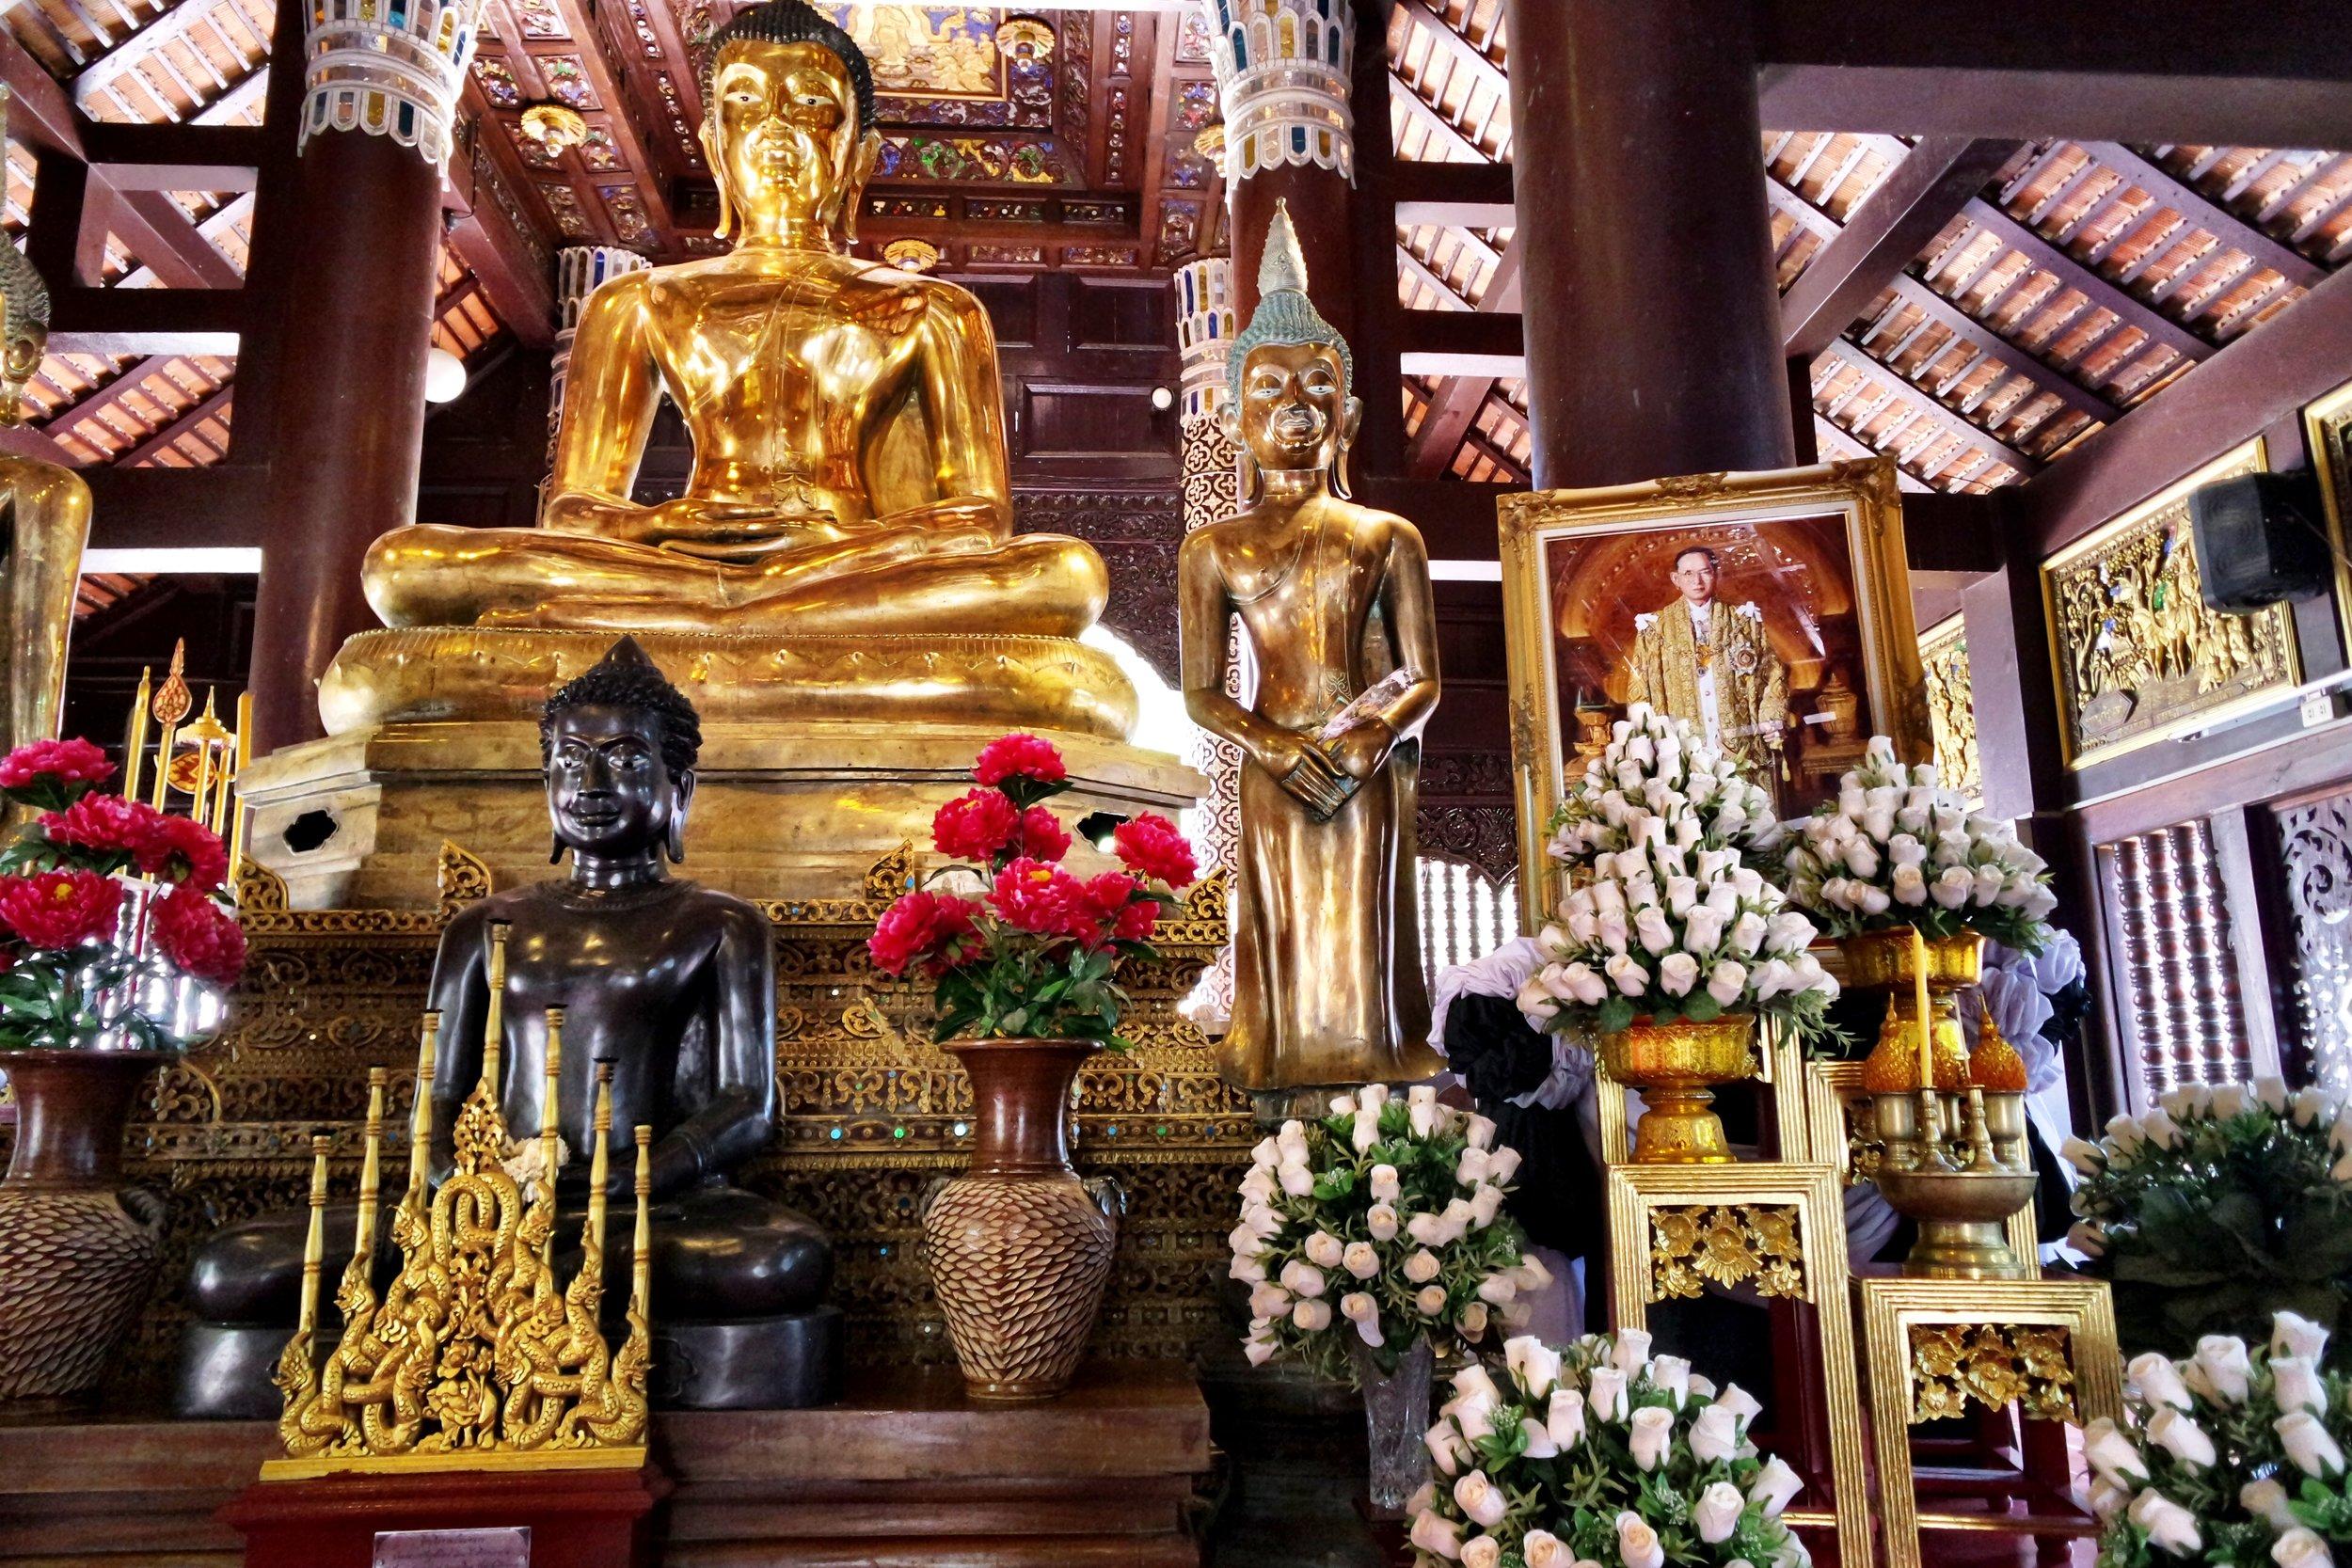 The Buddhas in Wat Lok Molee's viharn